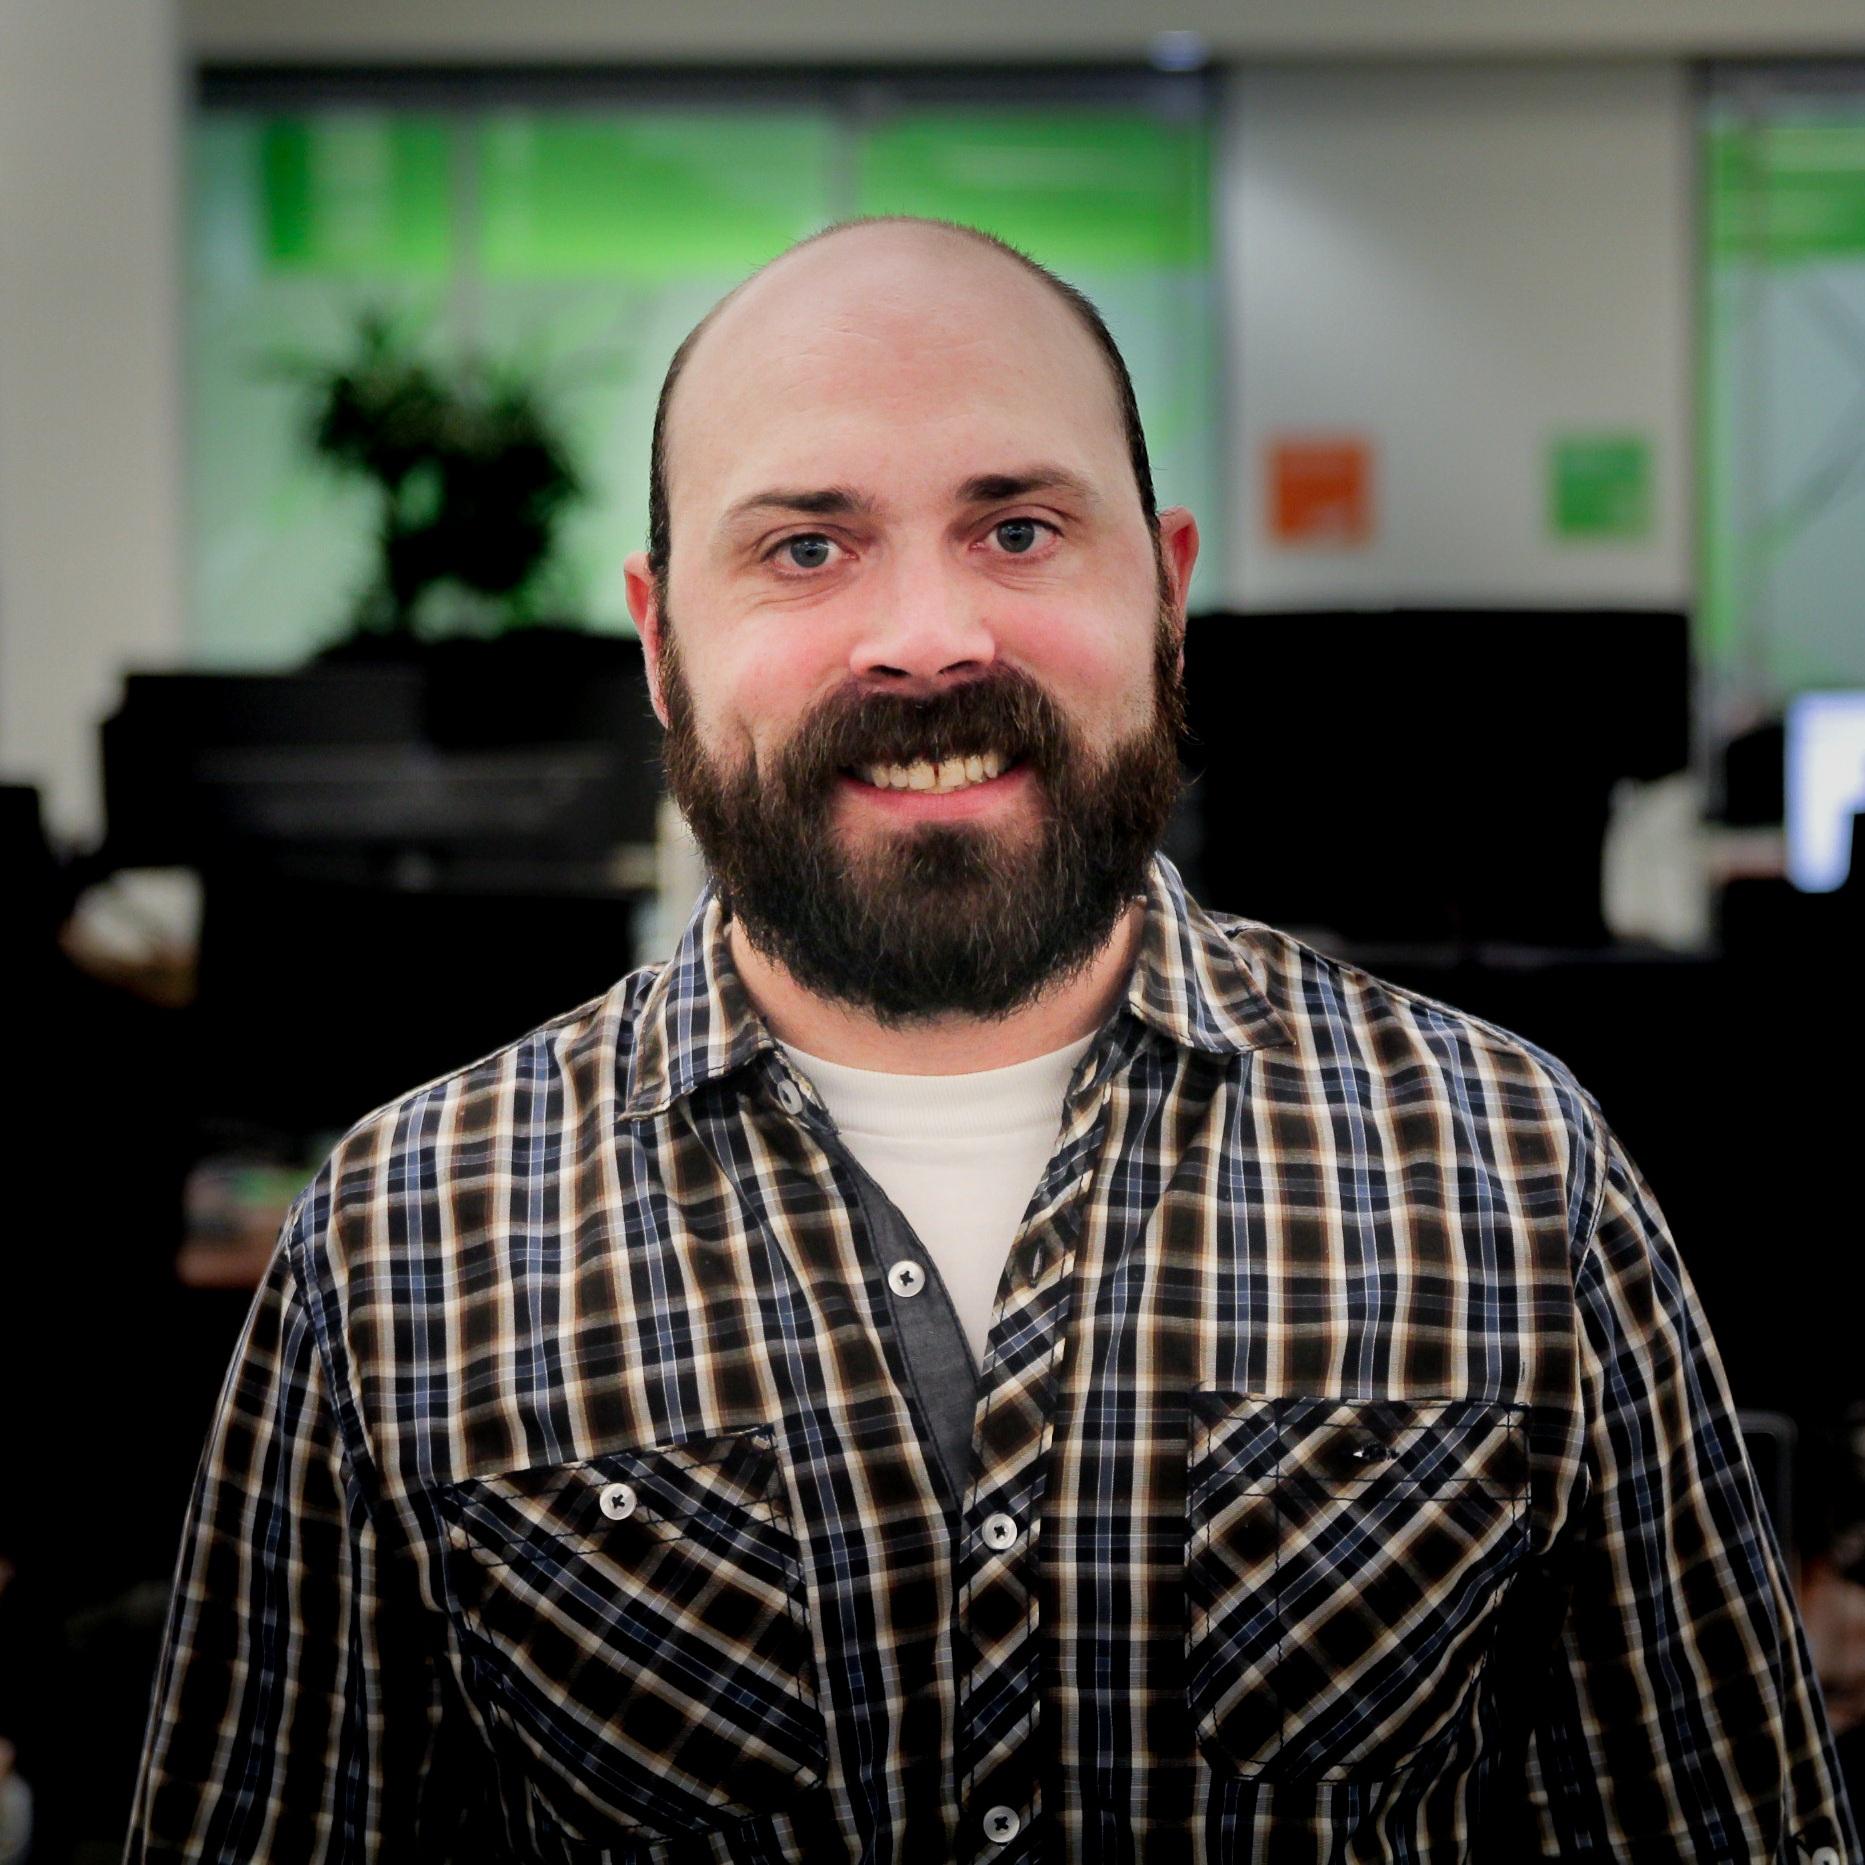 Tim Collins - Vice President, EngineeringDownload headshot